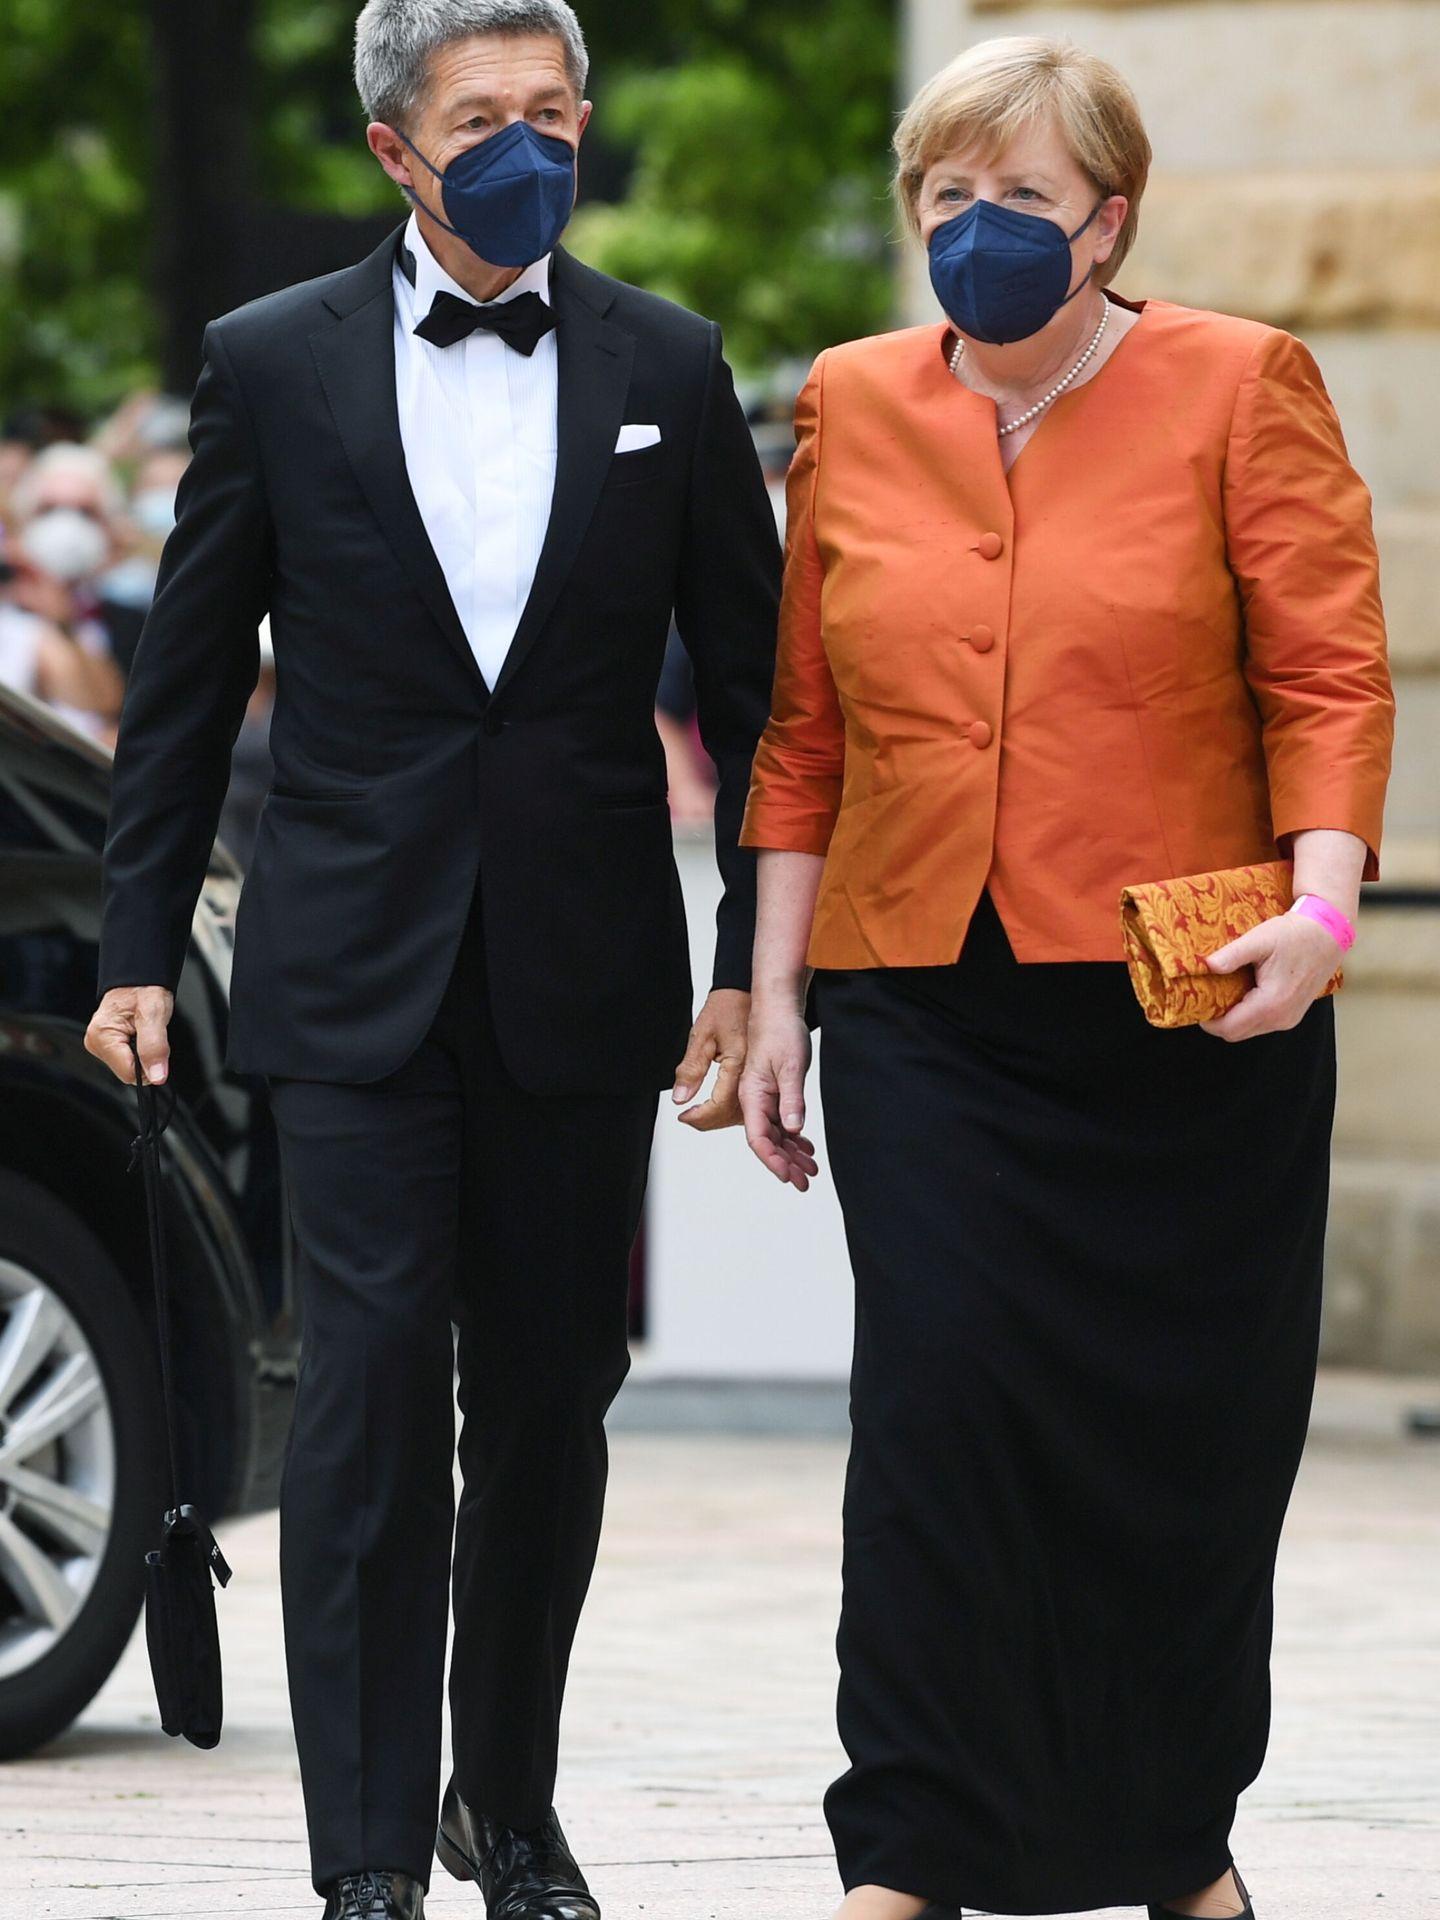 Angela Merkel y Joachim Sauer, en el festival de ópera Wagner en Bayreuth. (Reuters)